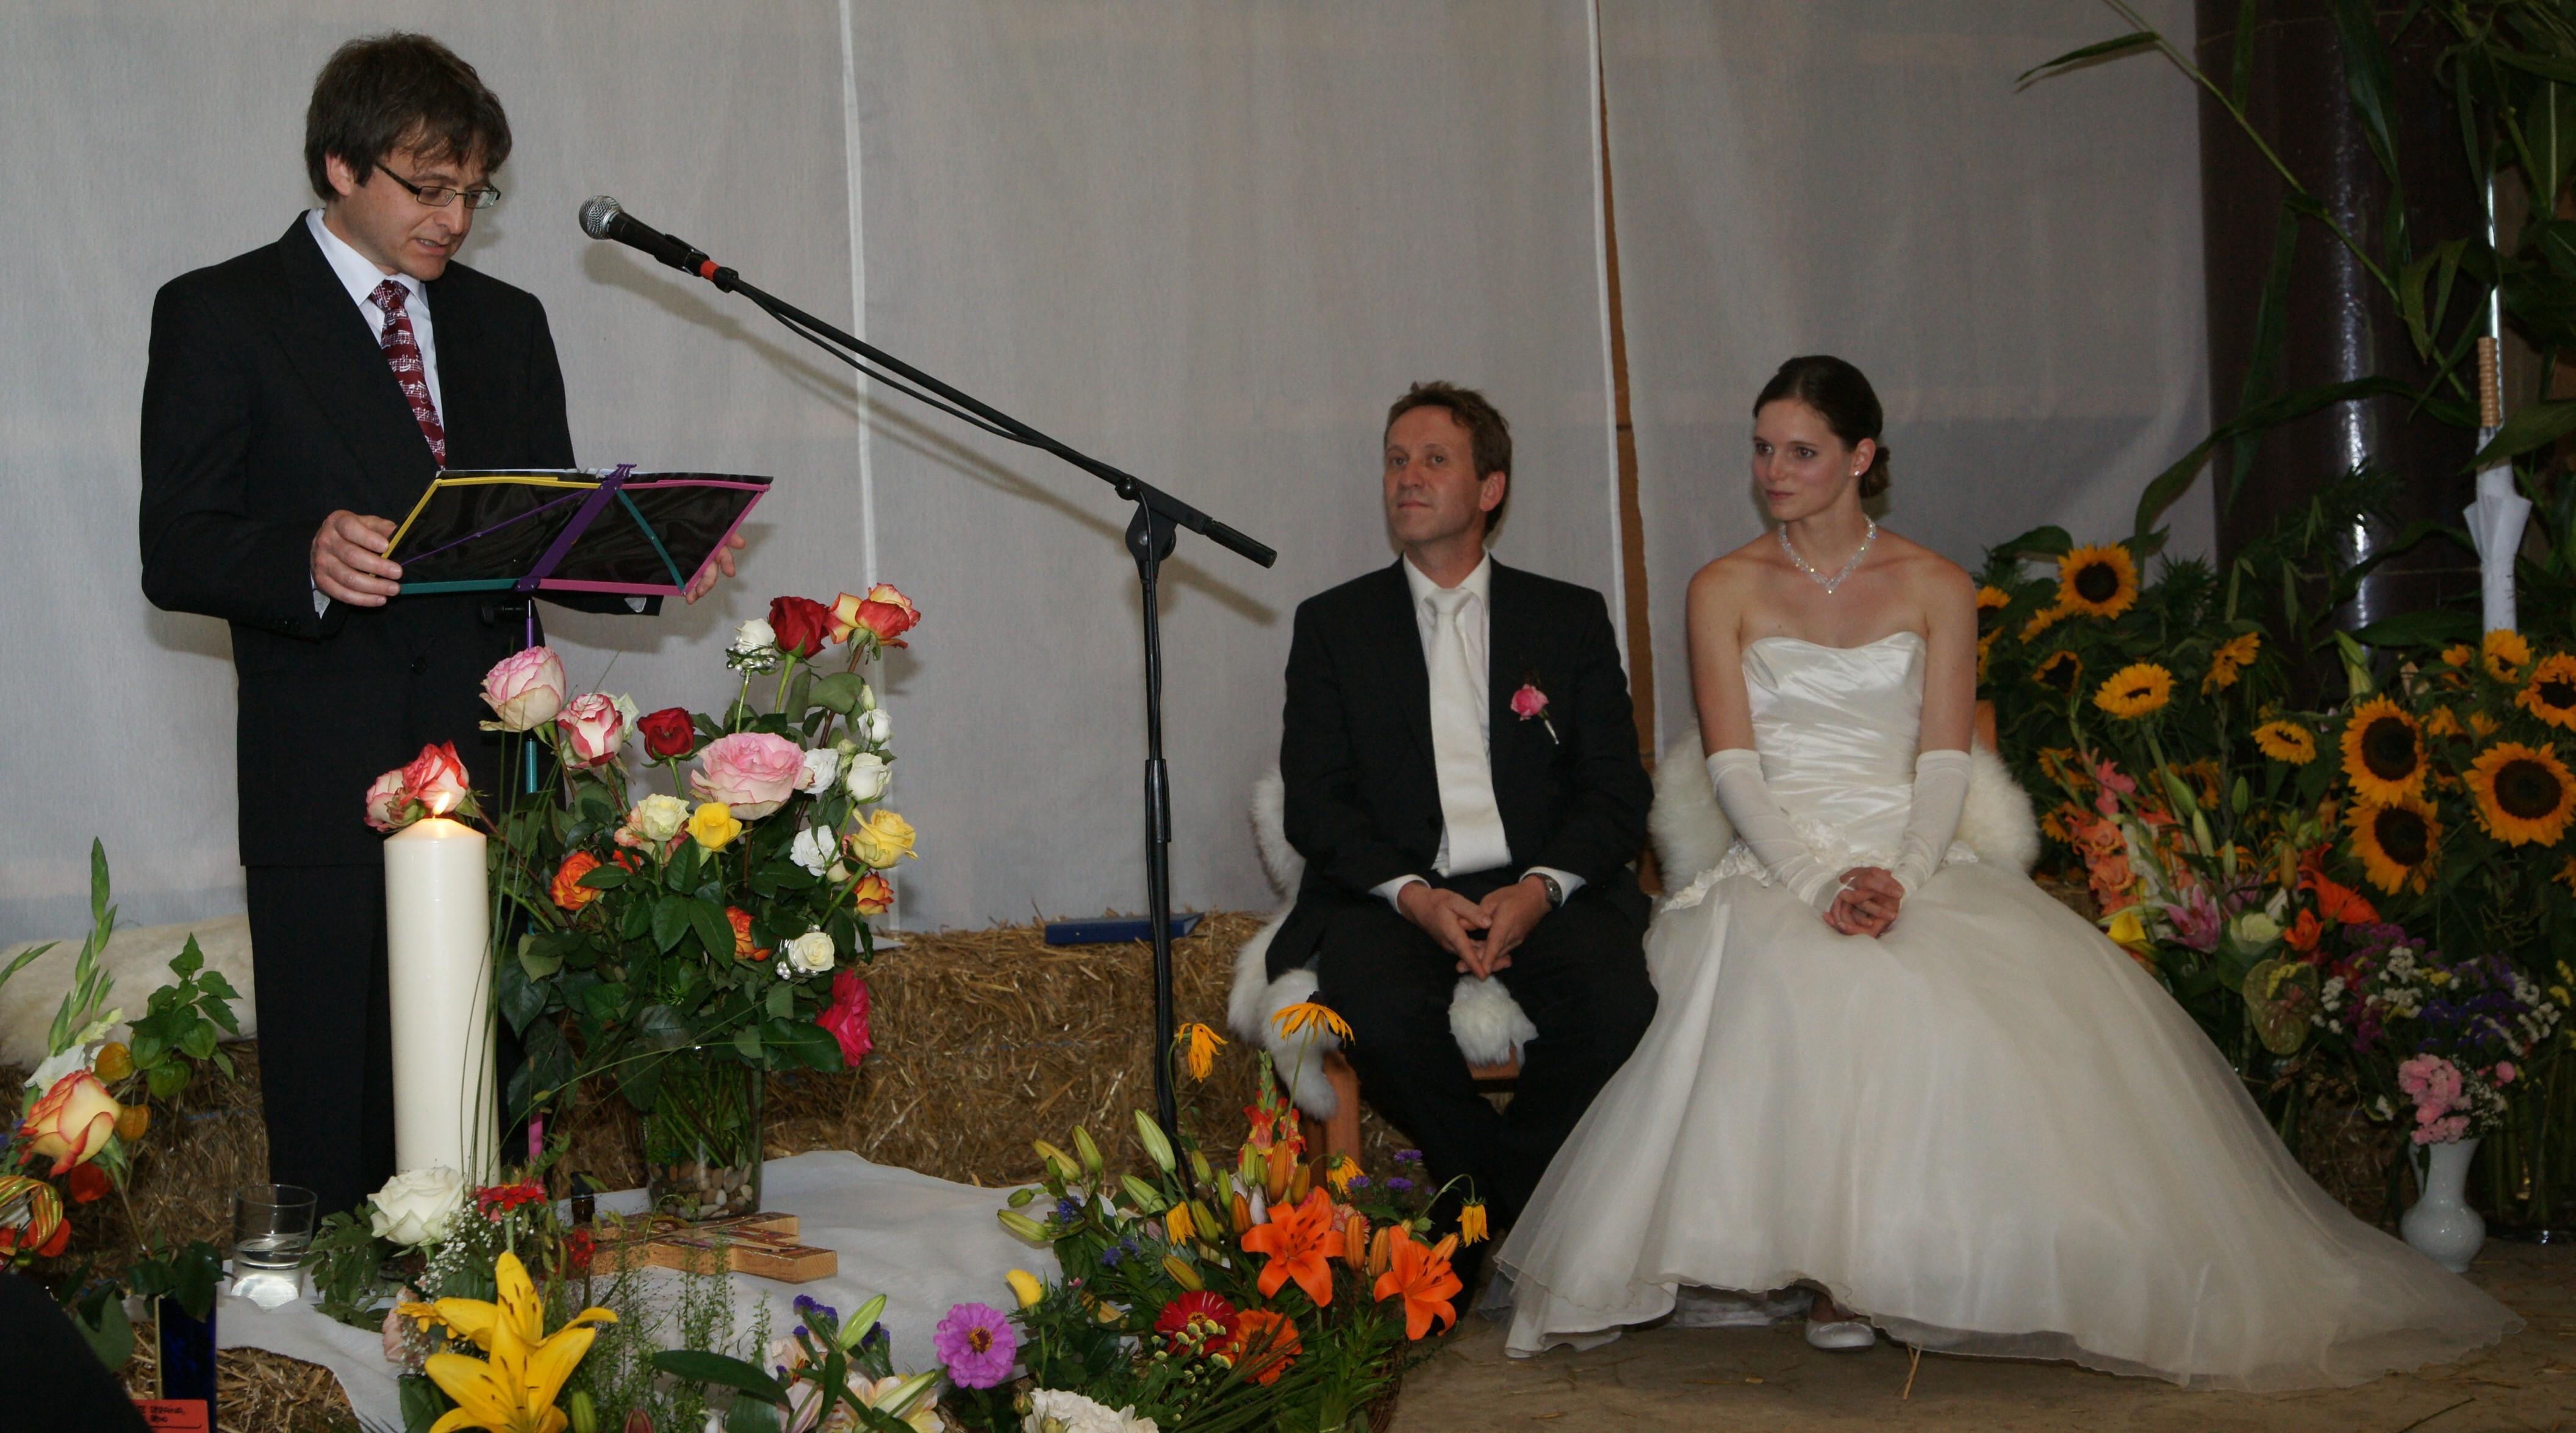 Ablauf Einer Hochzeit  Ablauf einer Hochzeit